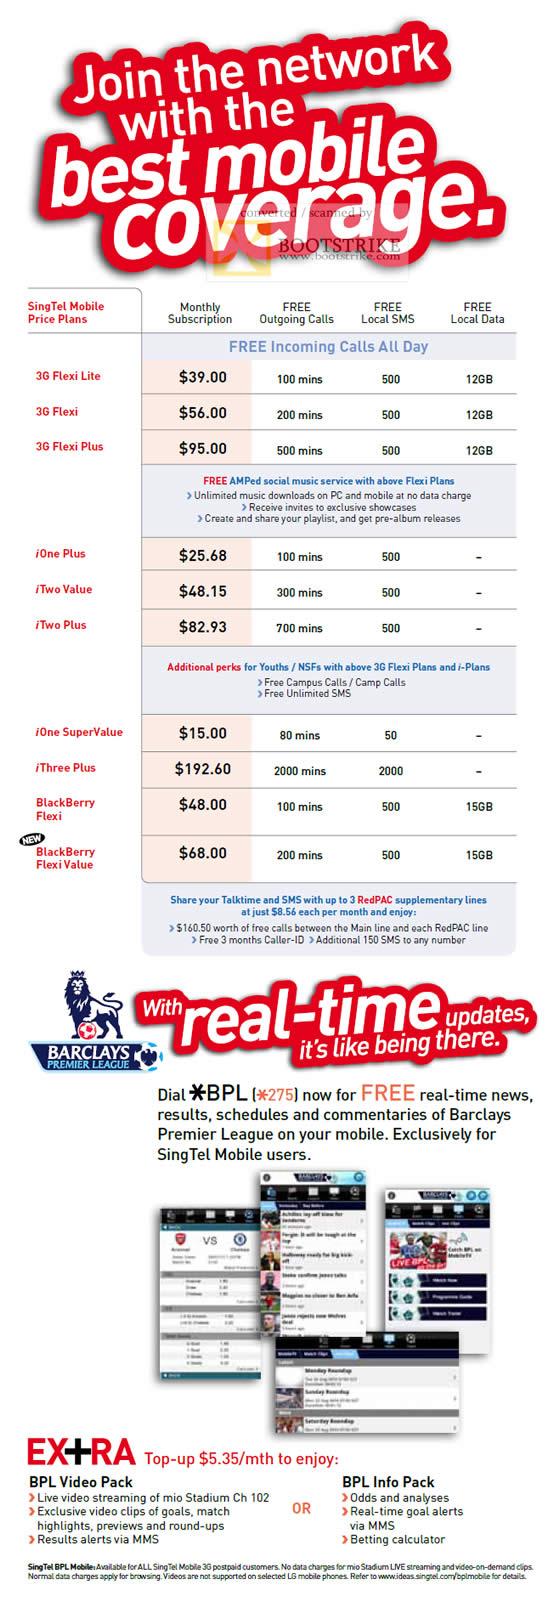 Comex 2010 price list image brochure of Singtel Mobile Price Plans 3G Flexi Lite Plus IOne Plus Value ITwo Barclays BPL Video Pack Info